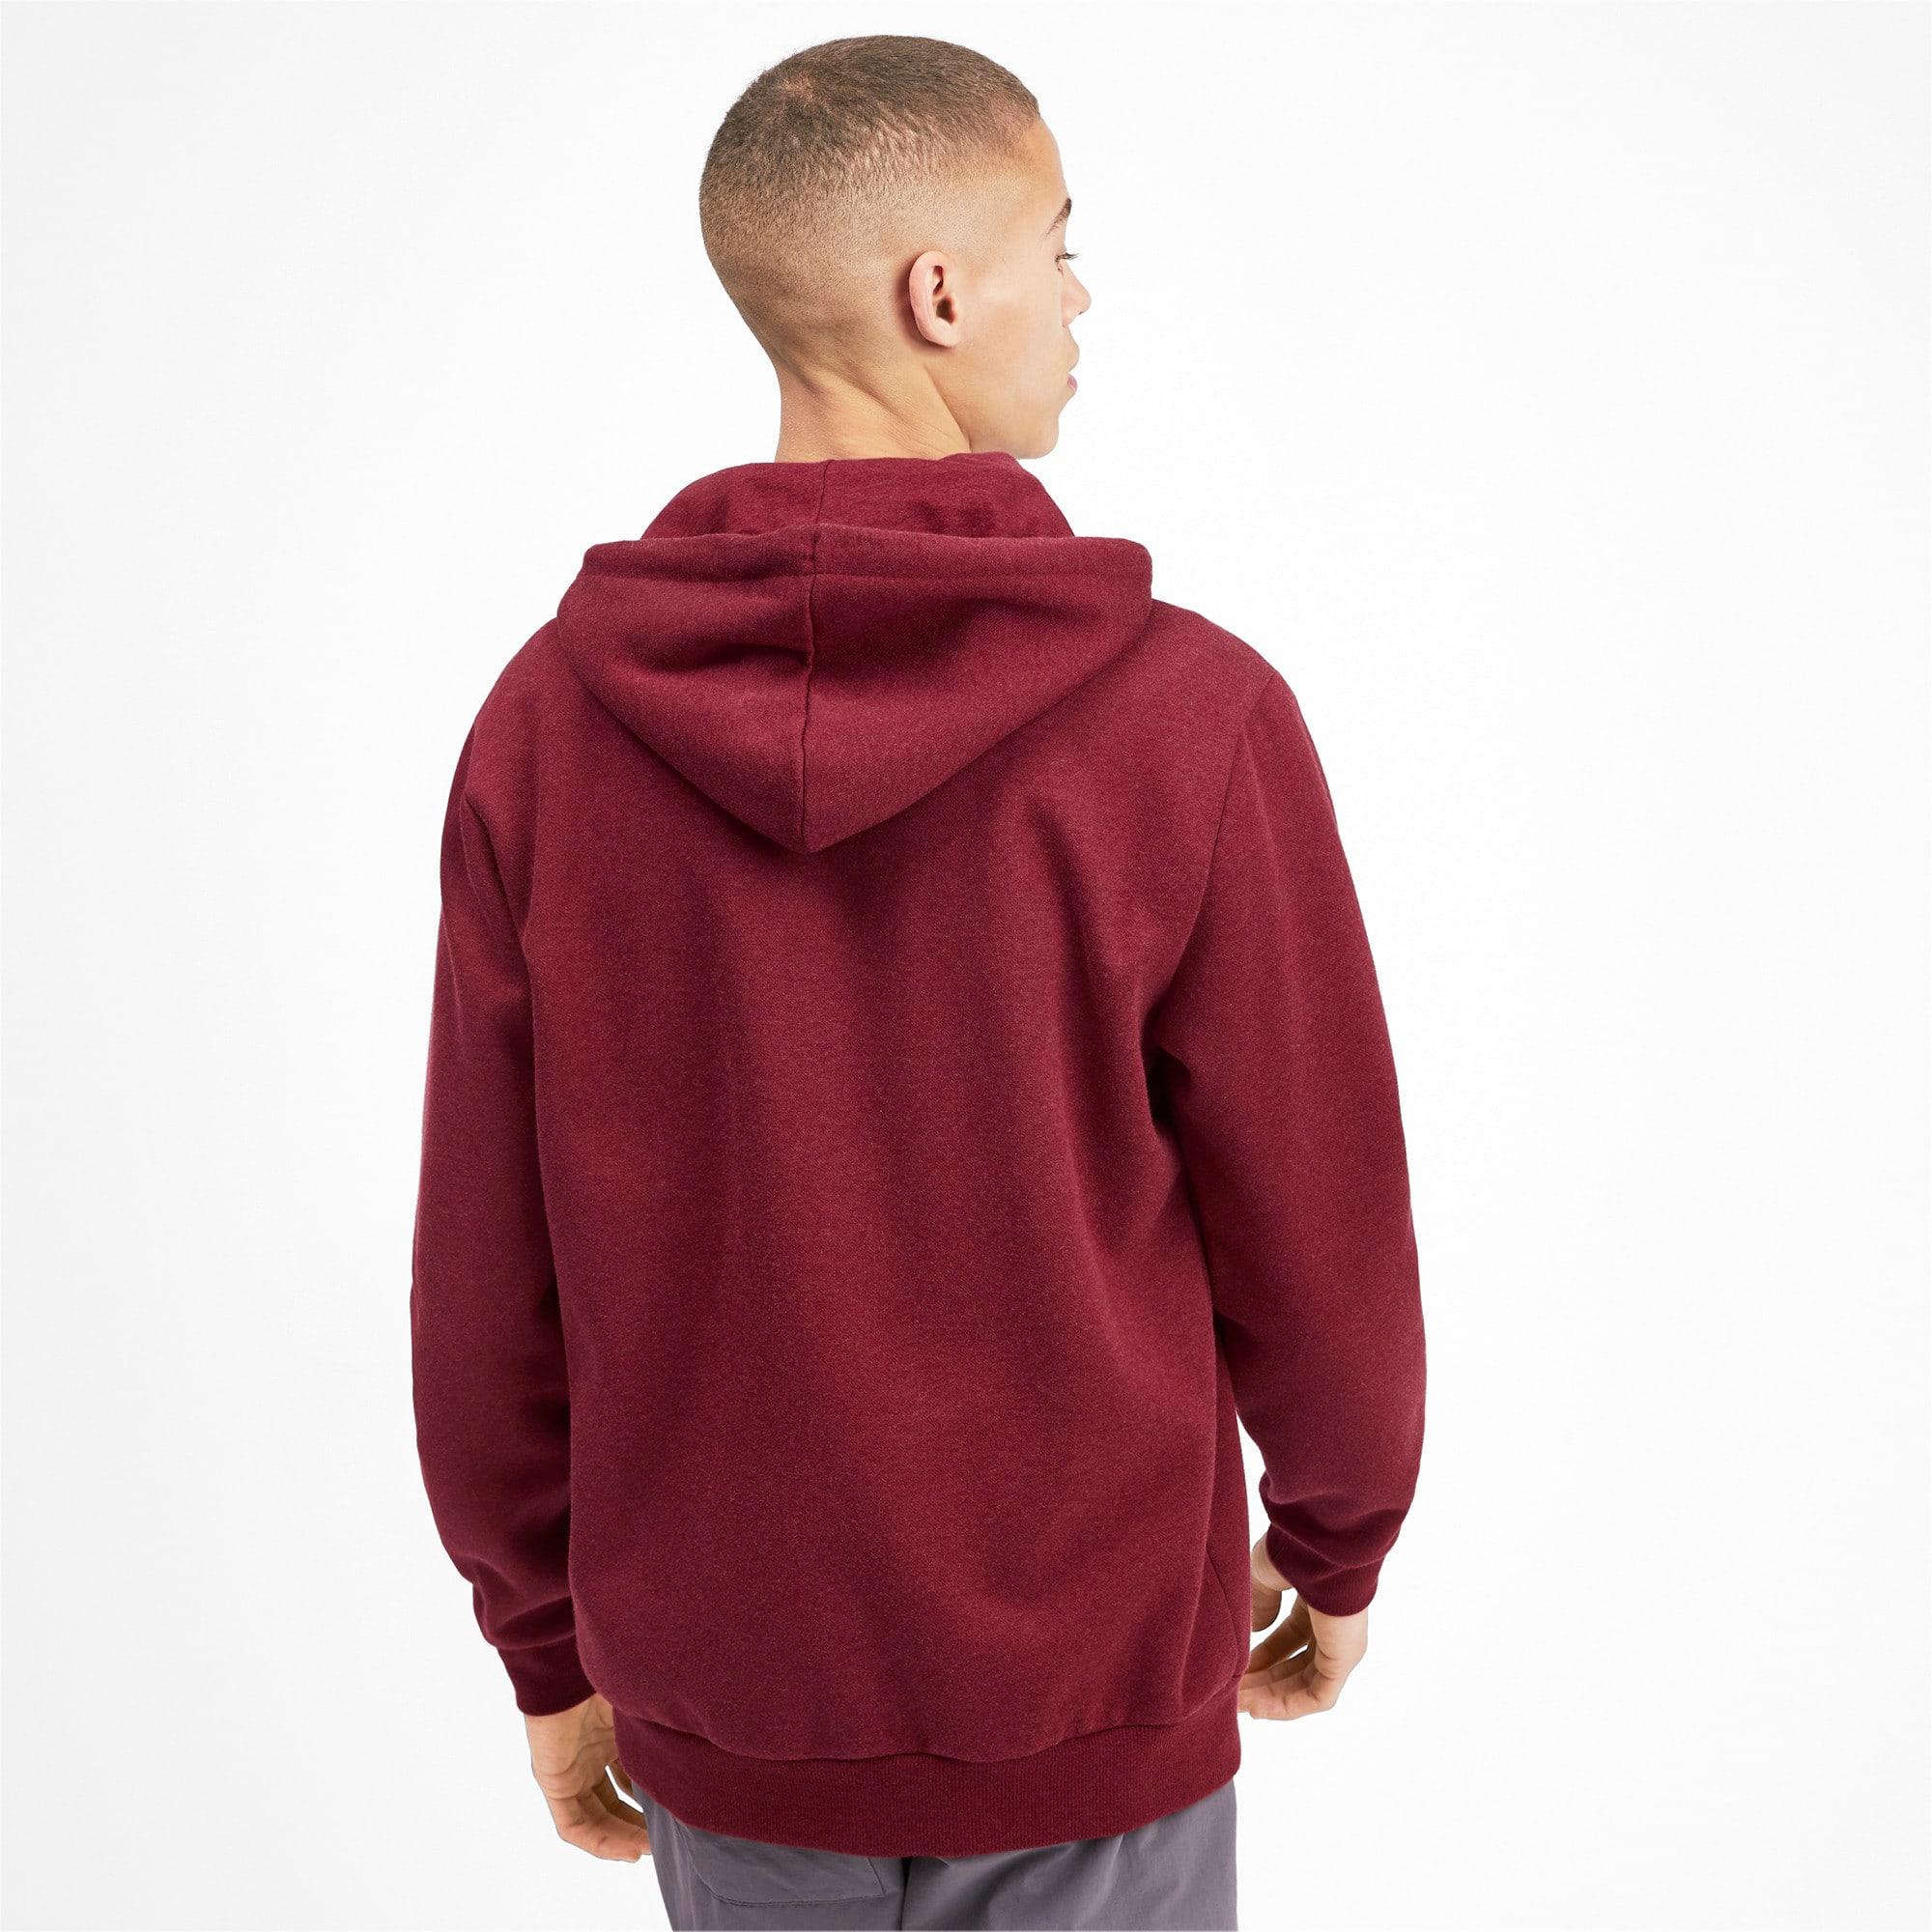 Thumbnail 3 of Essentials+ Men's Fleece Hooded Jacket, Rhubarb Heather, medium